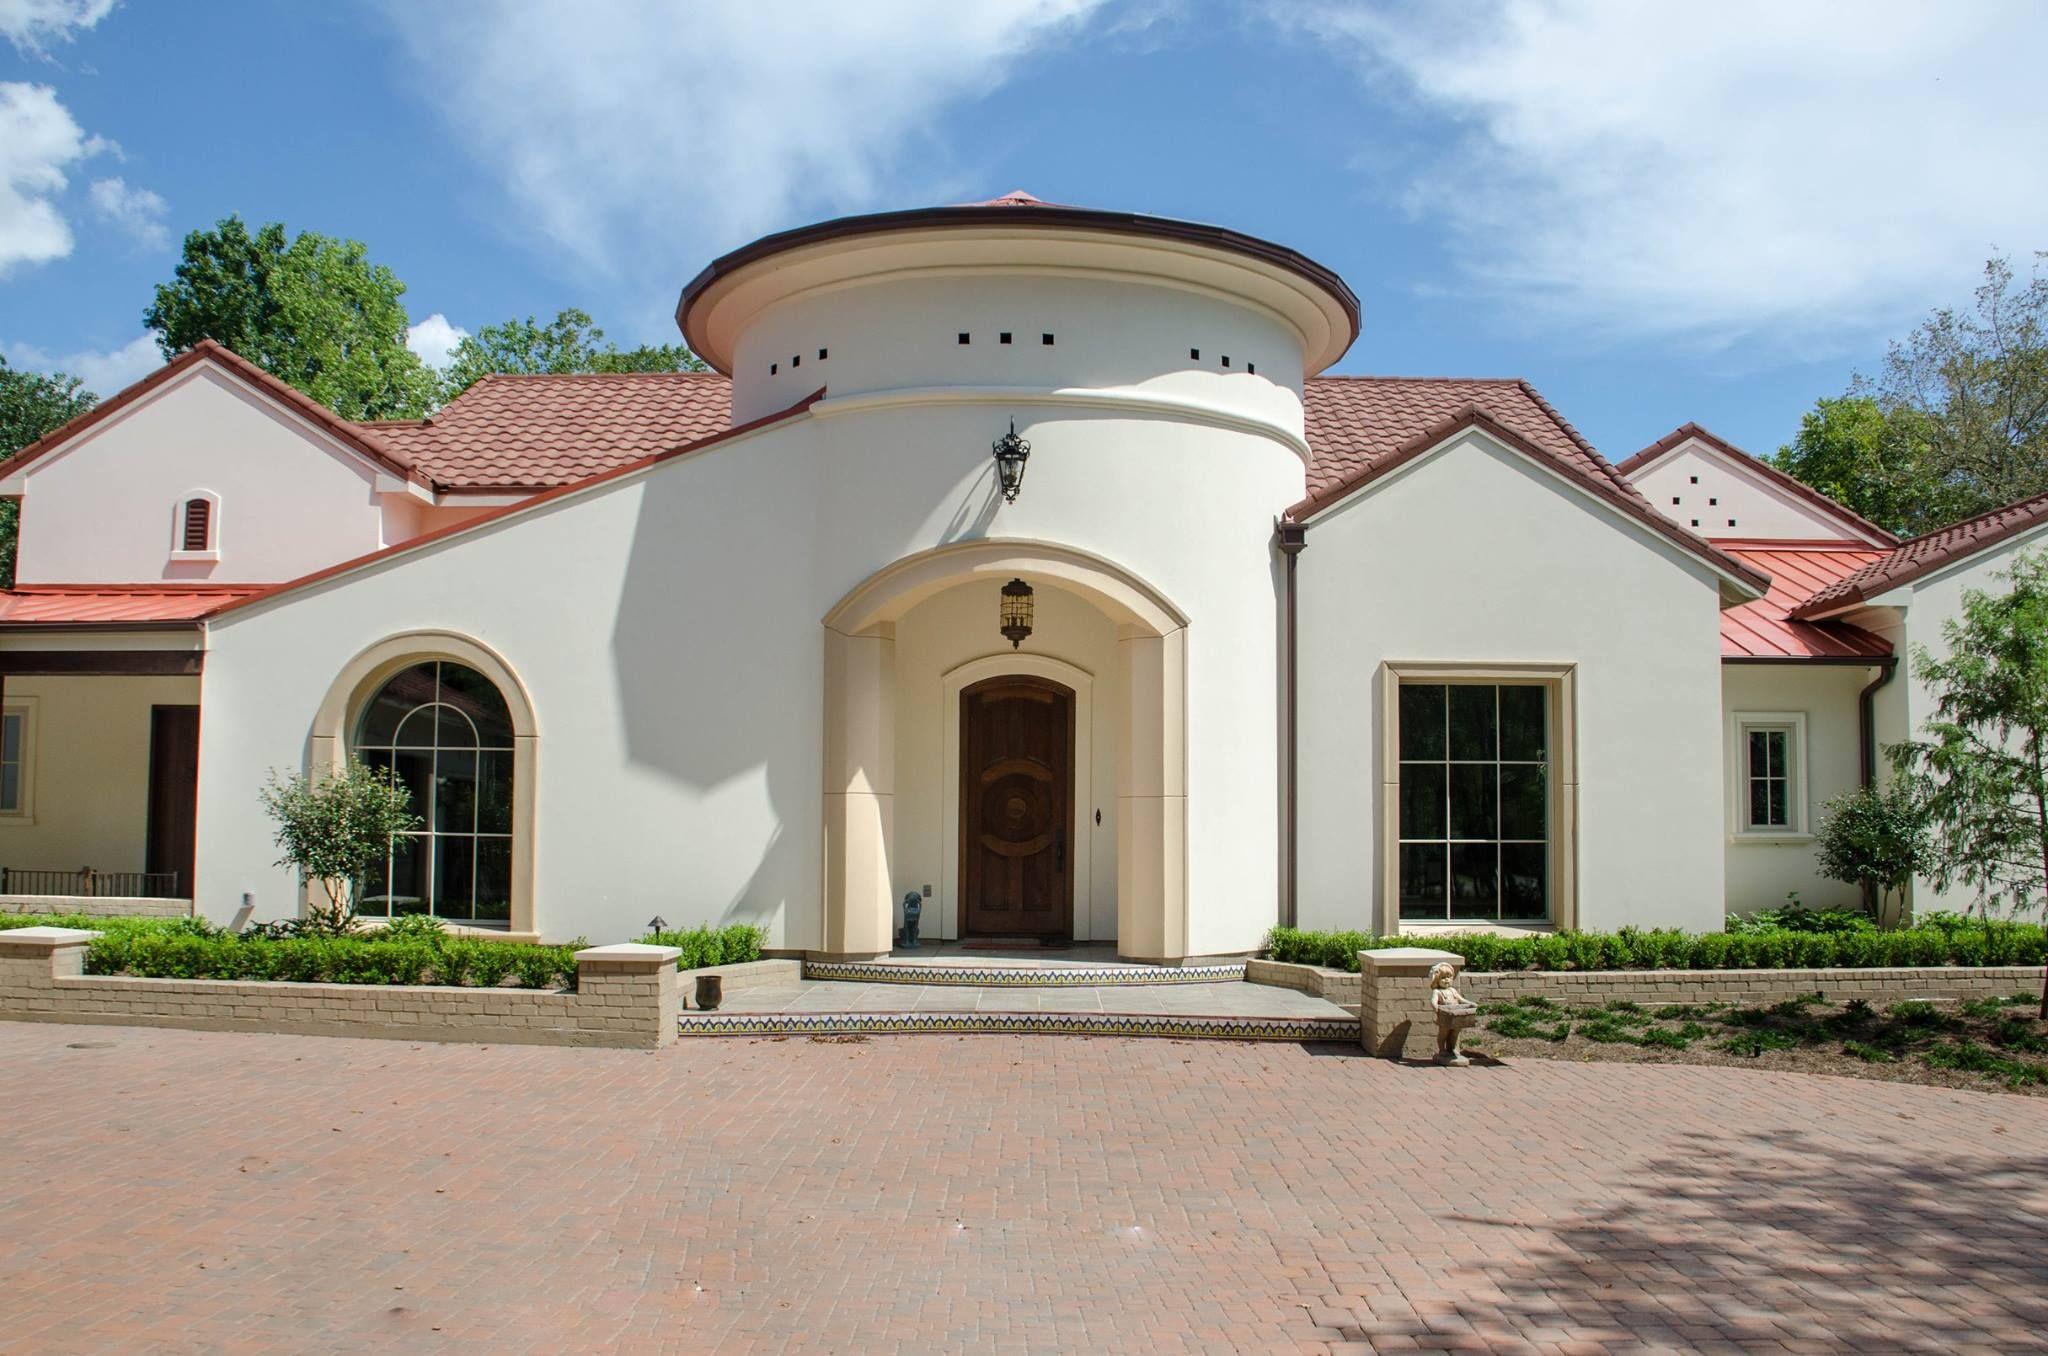 Photo courtesy of Jefferson Door Company | Learn more at .weathershield.com & Photo courtesy of Jefferson Door Company | Learn more at www ...